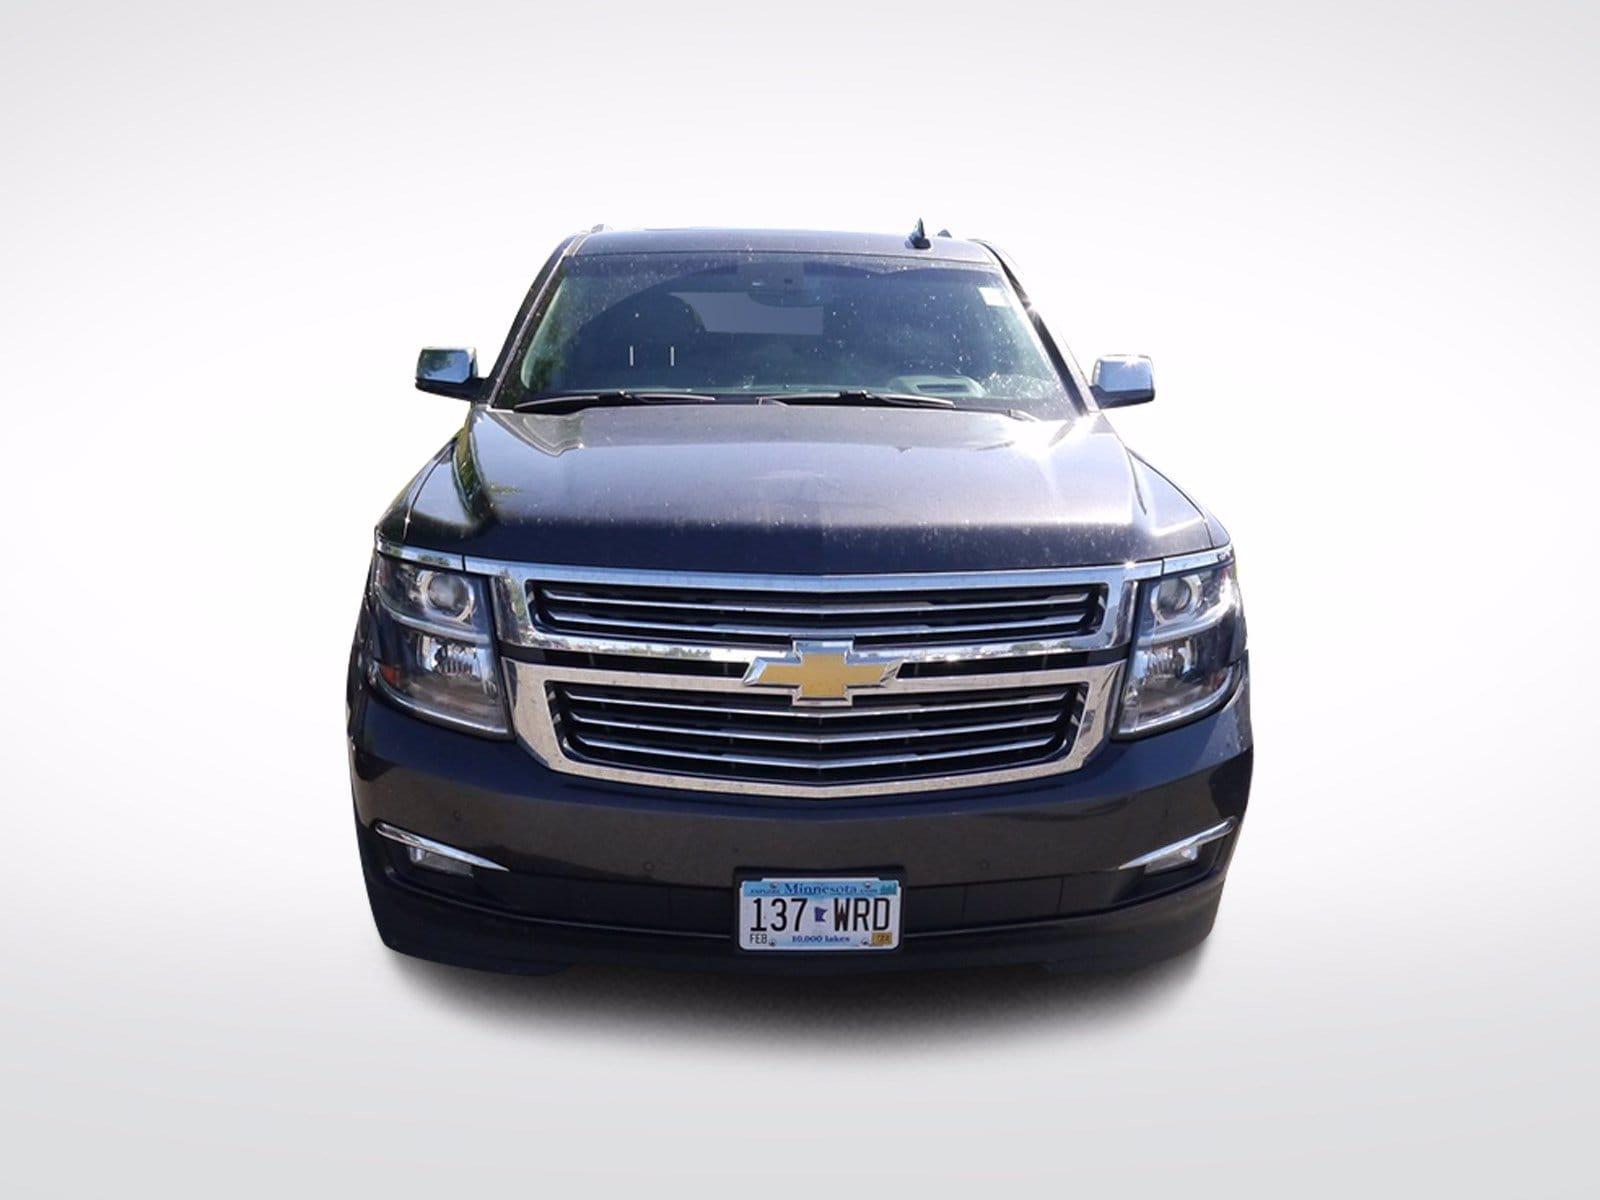 Used 2017 Chevrolet Suburban Premier with VIN 1GNSKJKC7HR254383 for sale in Baxter, Minnesota